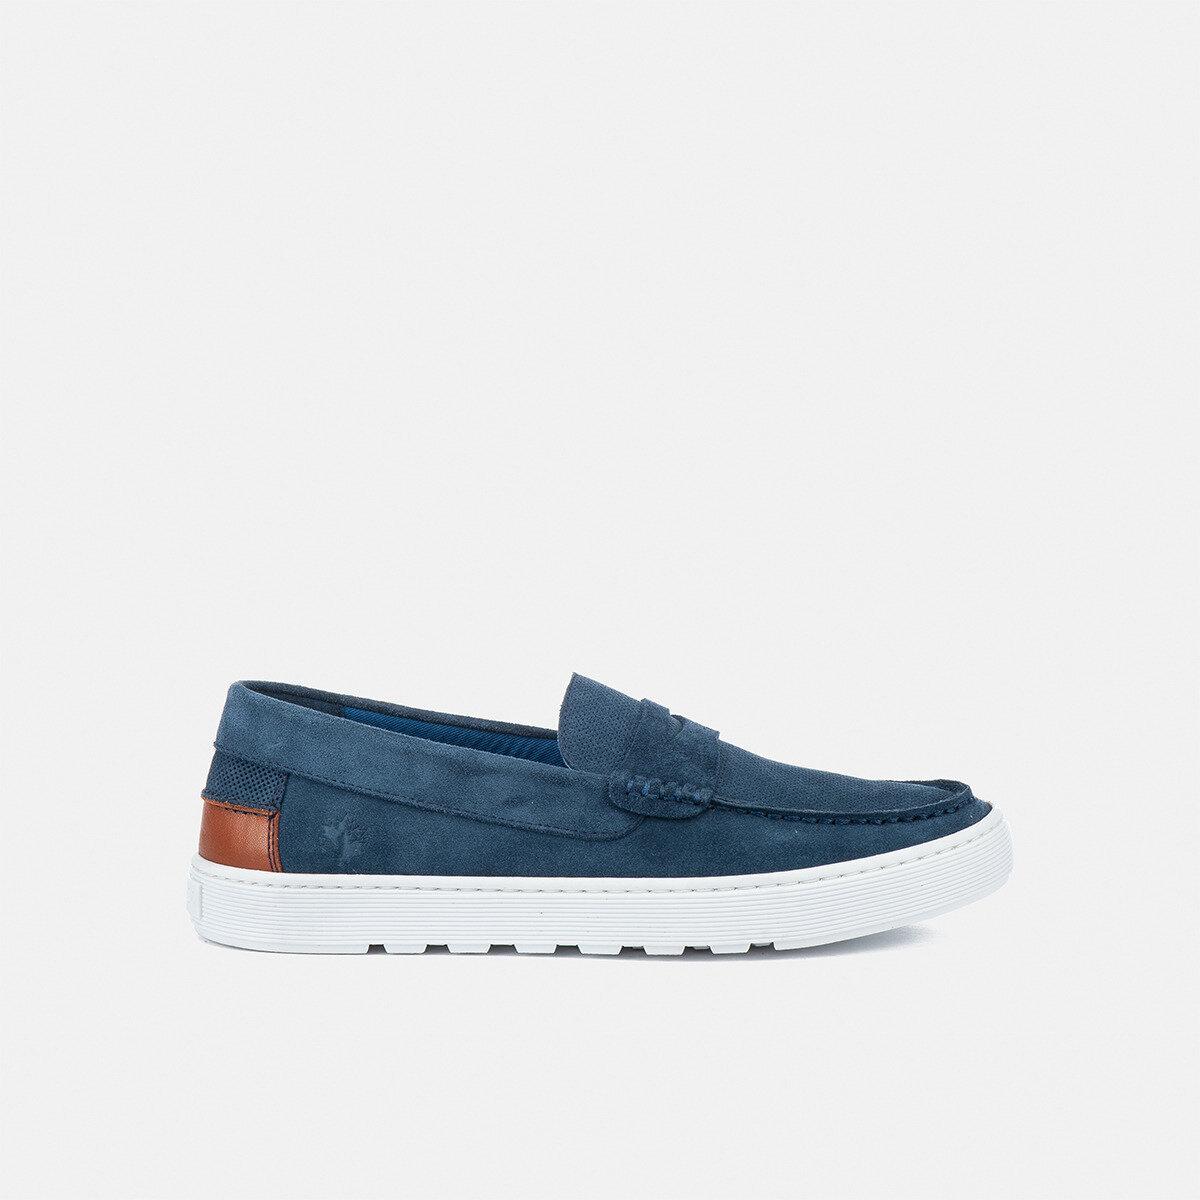 WAYNE MOOD INDIGO BLUE Man Loafers